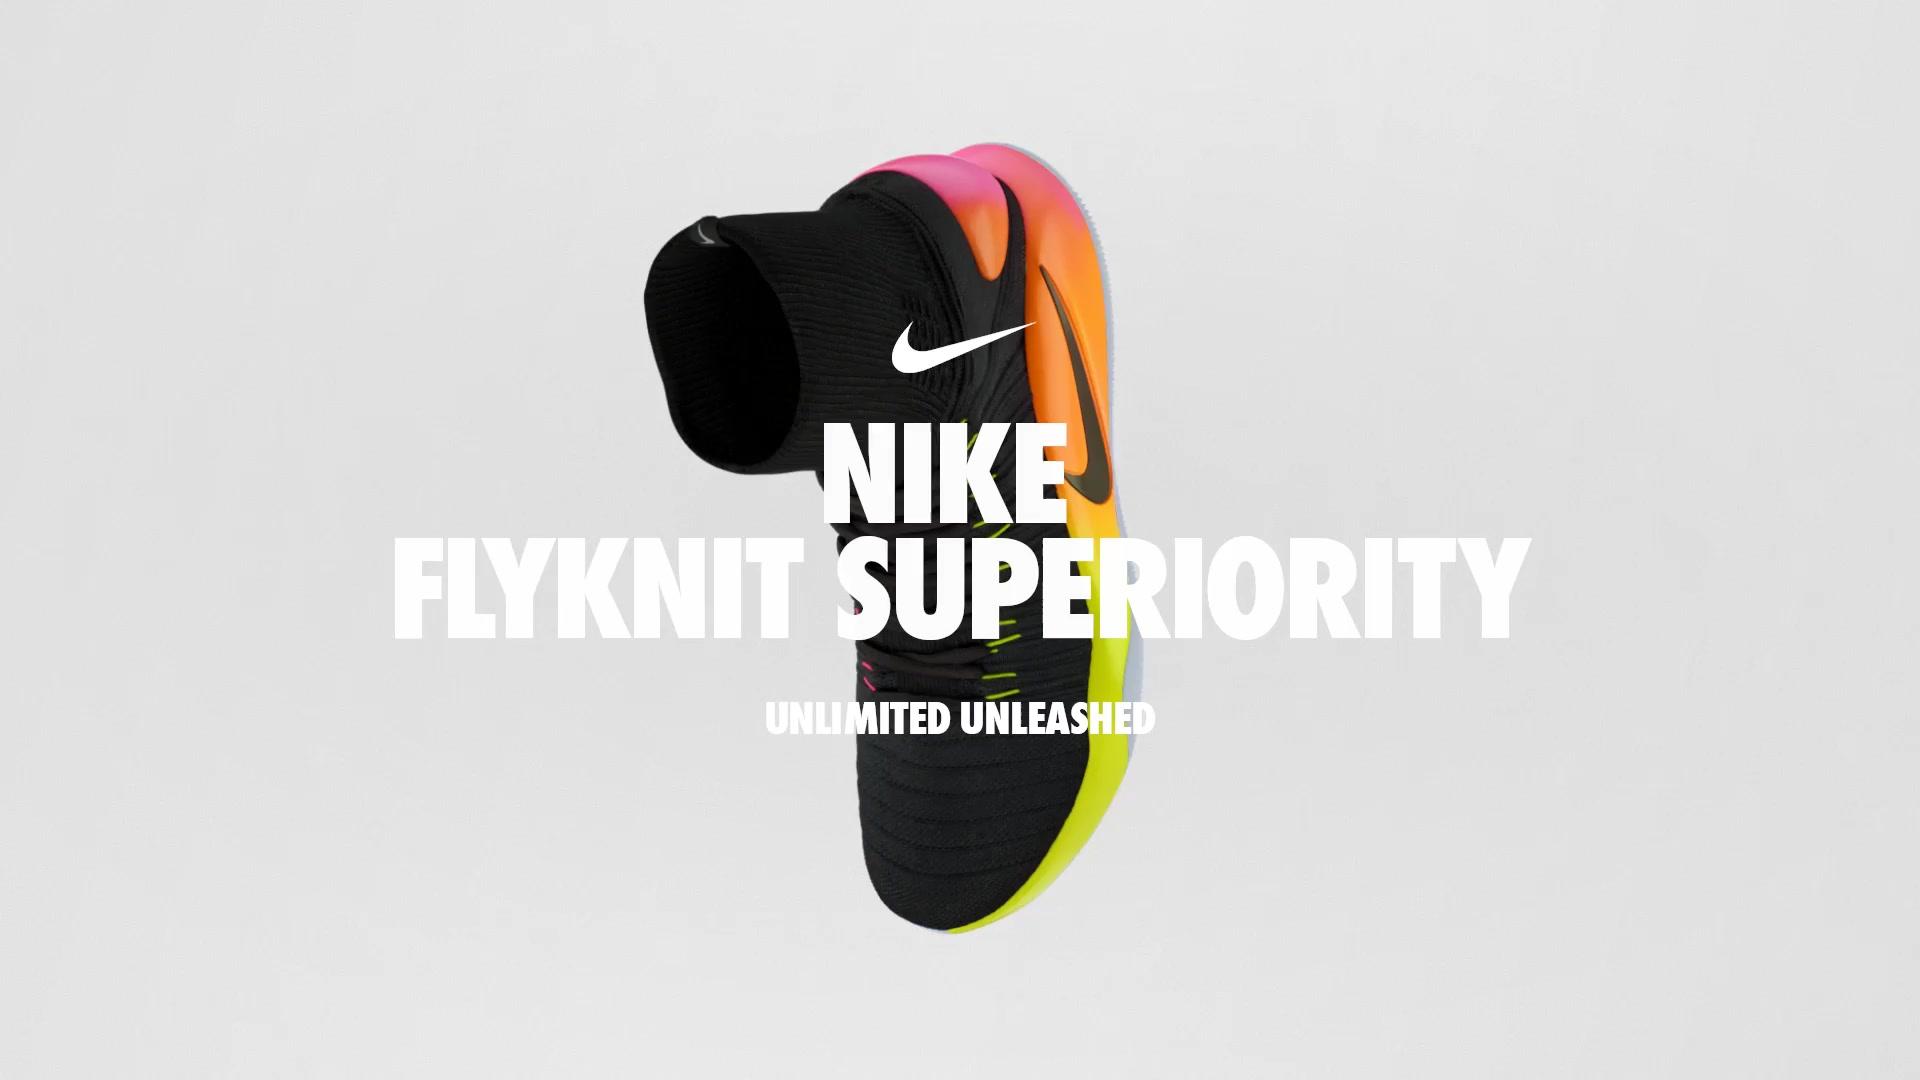 Nike Flyknit 3d shoe cgi design video edit render